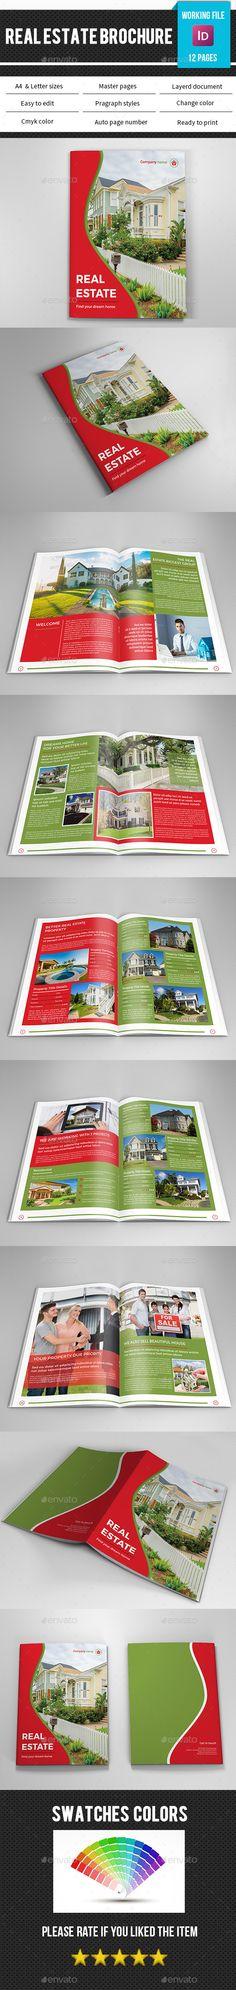 Real Estate Agency Brochure Catalog v4 Real estate agency - real estate brochure template